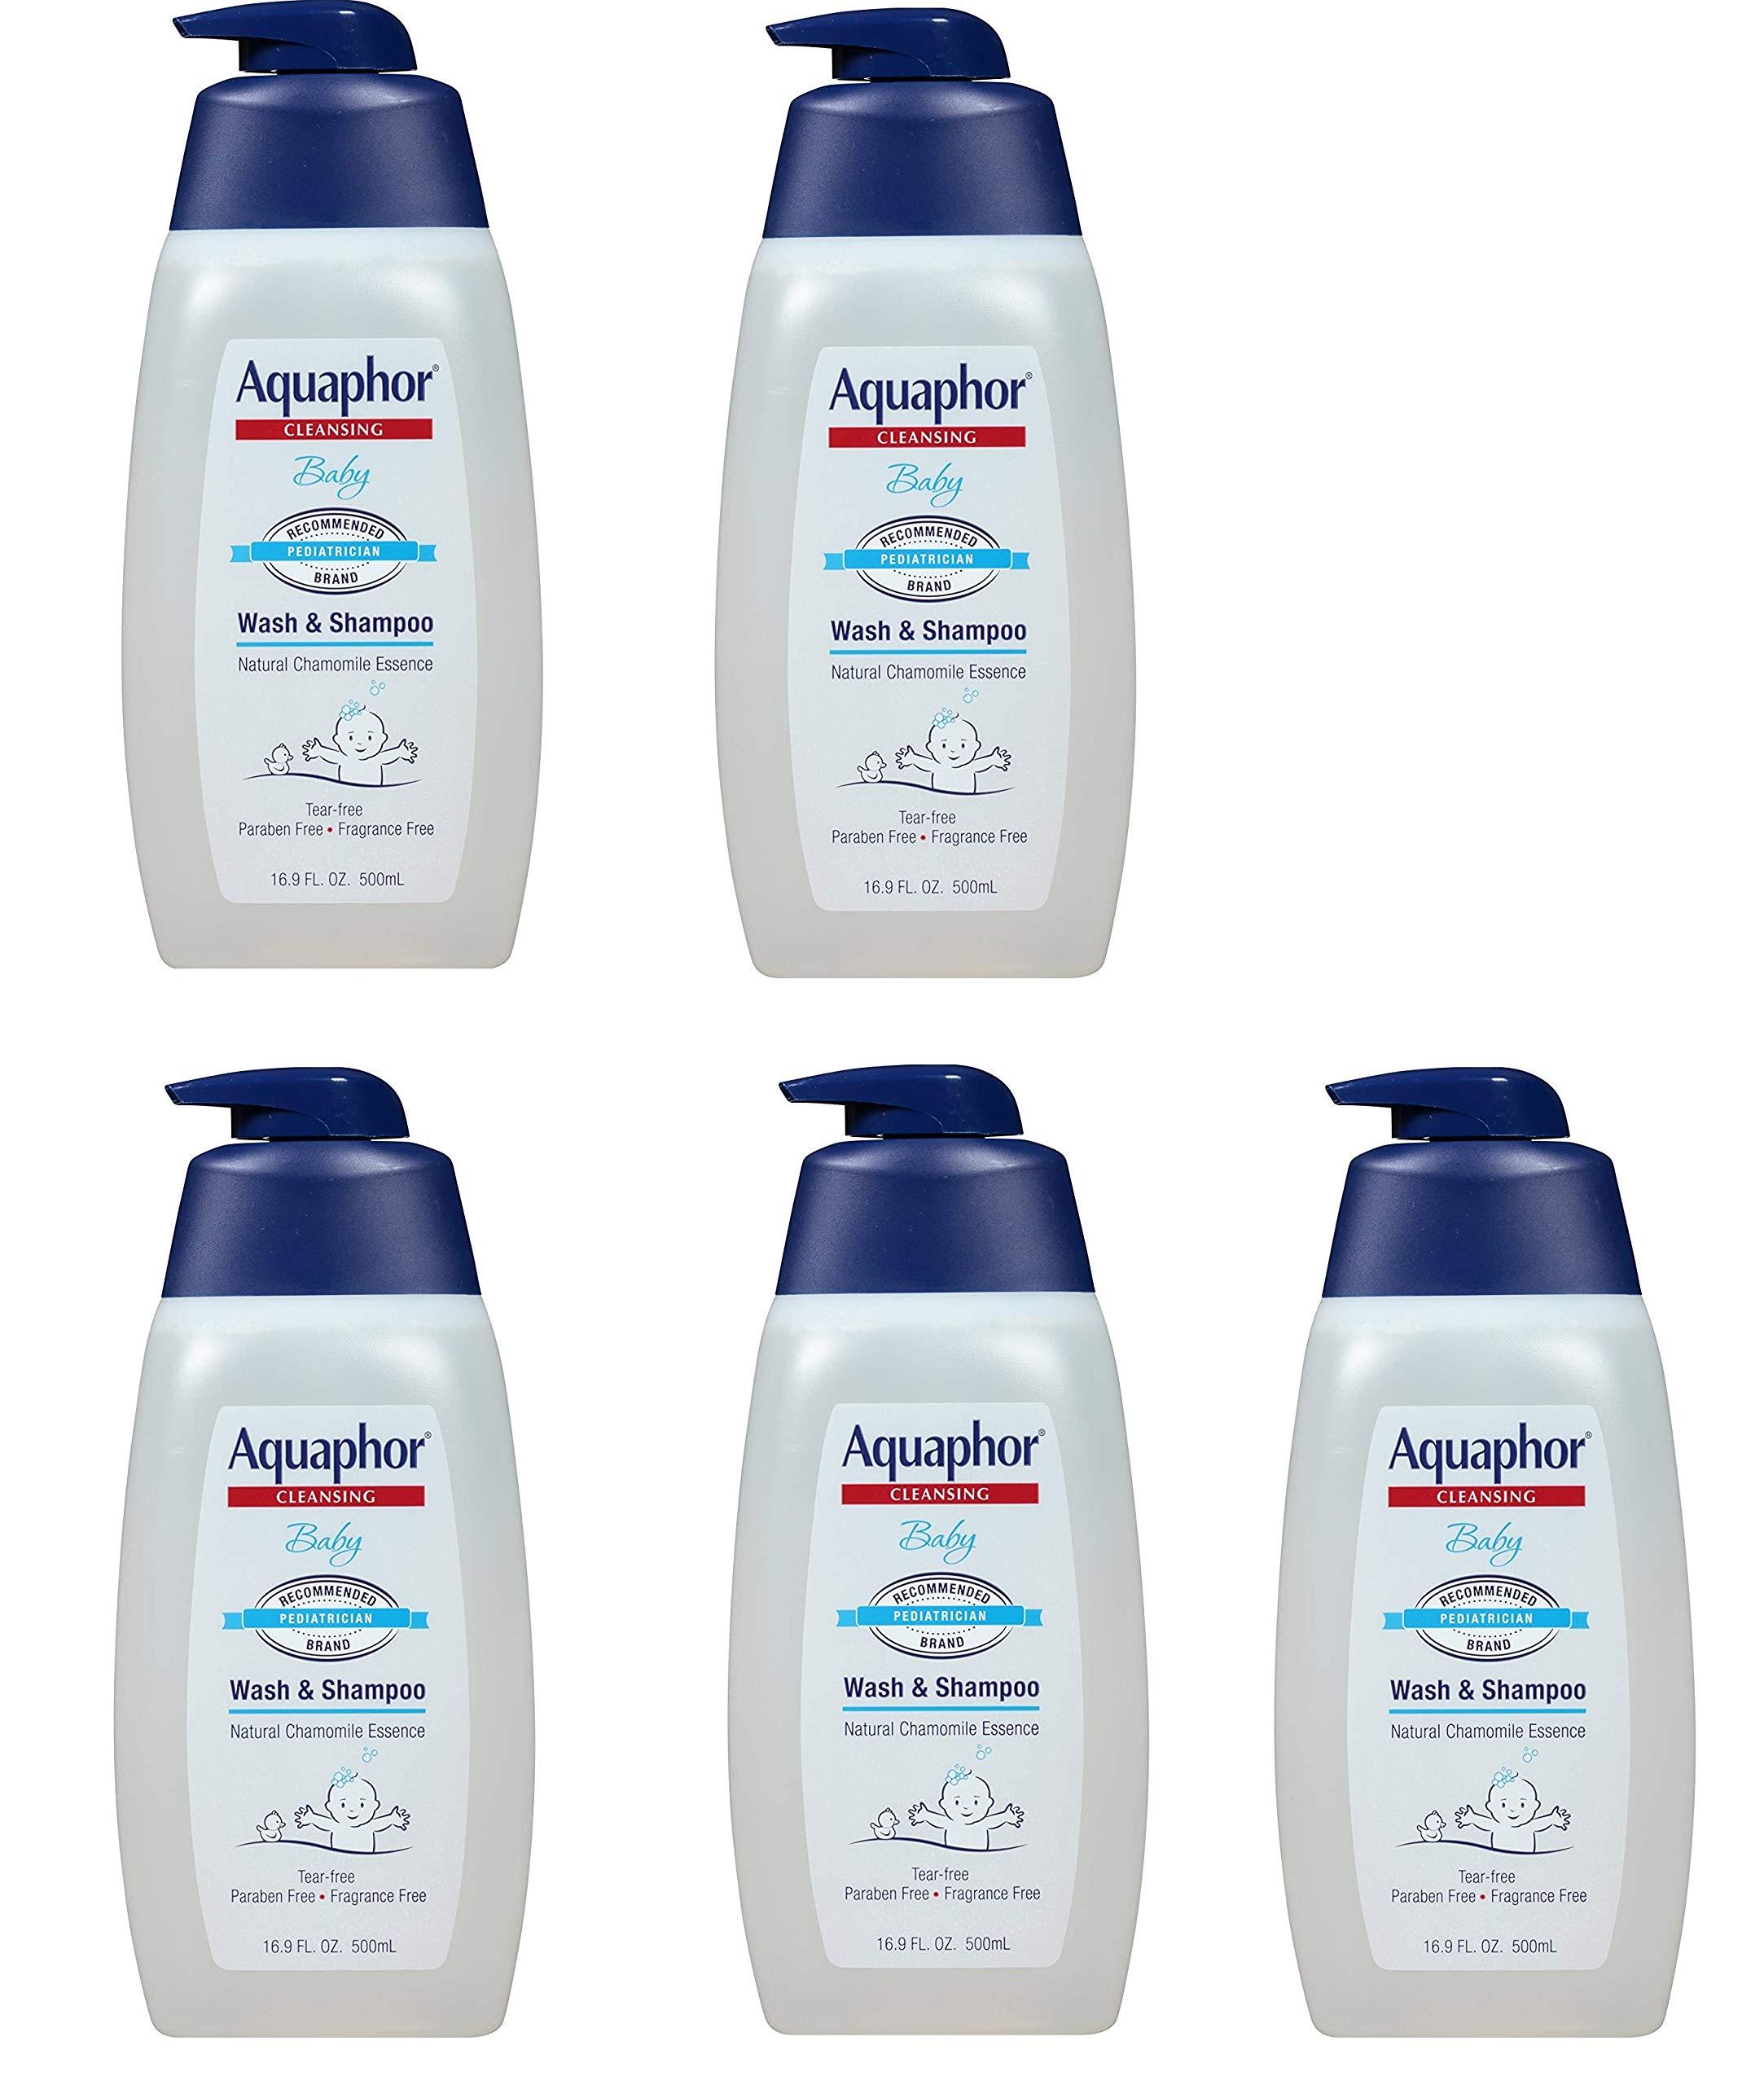 Aquaphor Baby Wash and Shampoo - Mild, Tear-free 2-in-1 Solution for Babyâ€s Sensitive Skin - 16.9 fl. oz. Pump, 5 Pack by Aquaphor